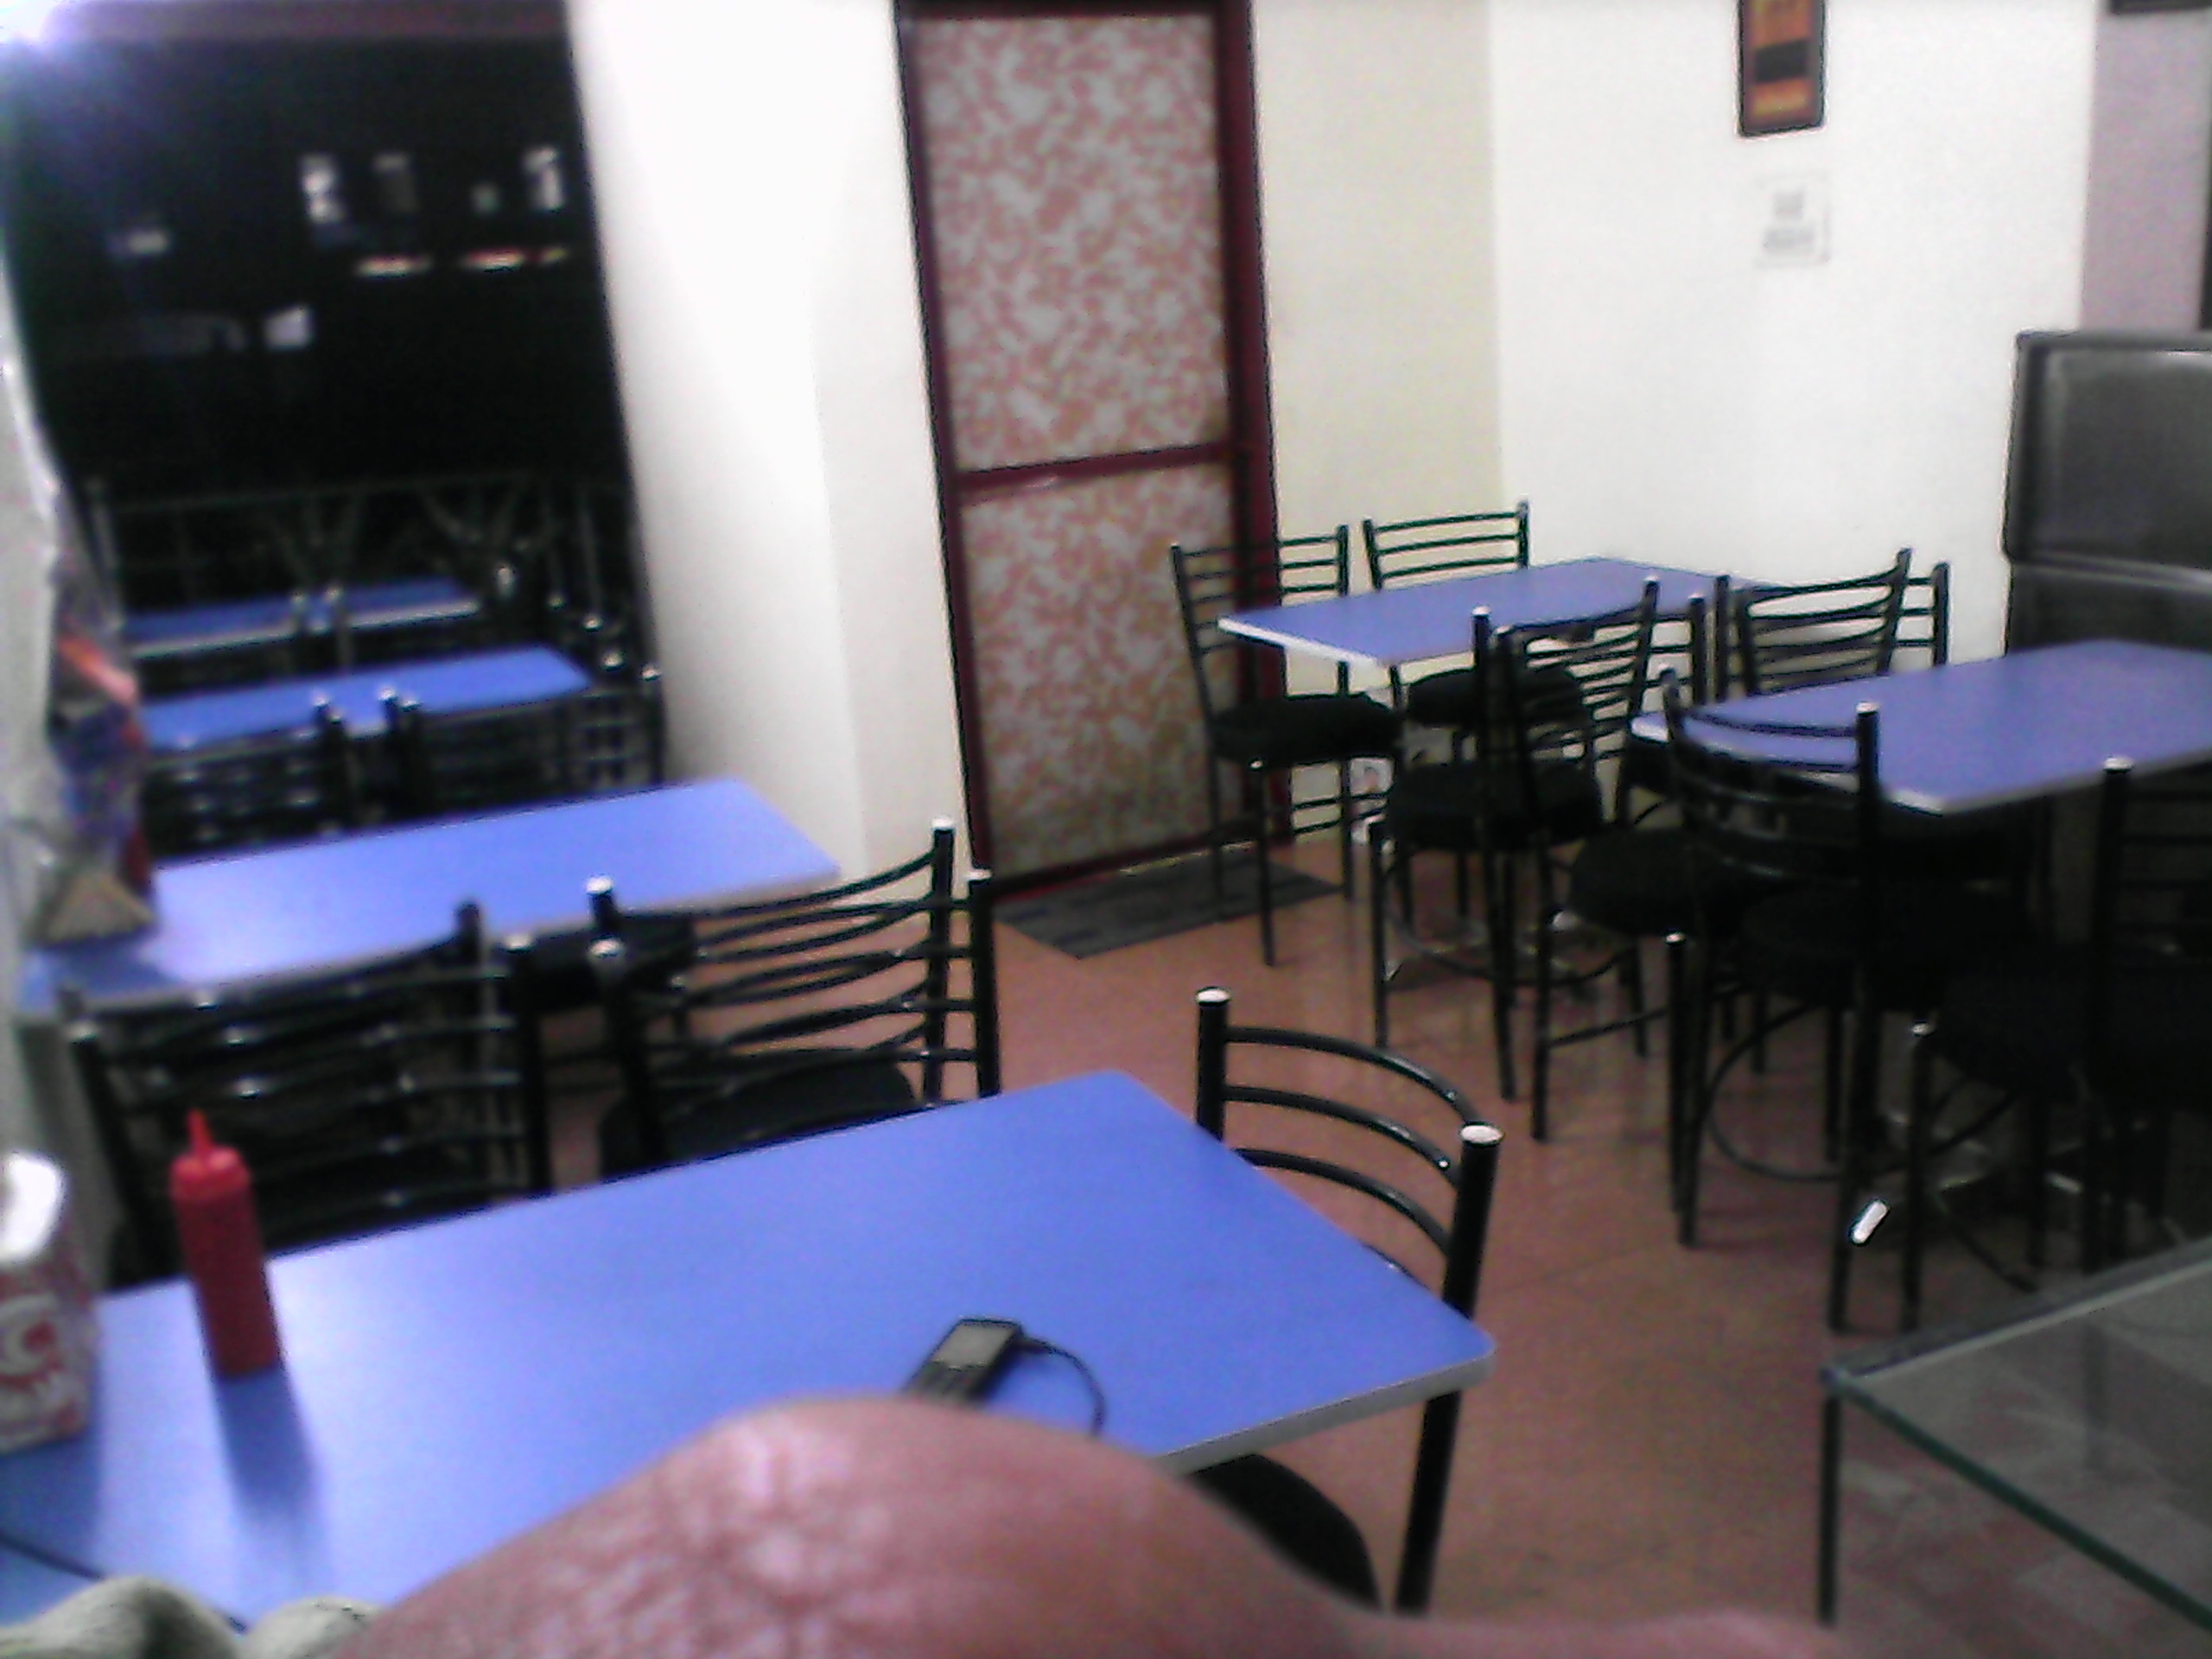 400 Sqft Fully Furnished Restaurant for Sale in MP Nagar - Bhopal